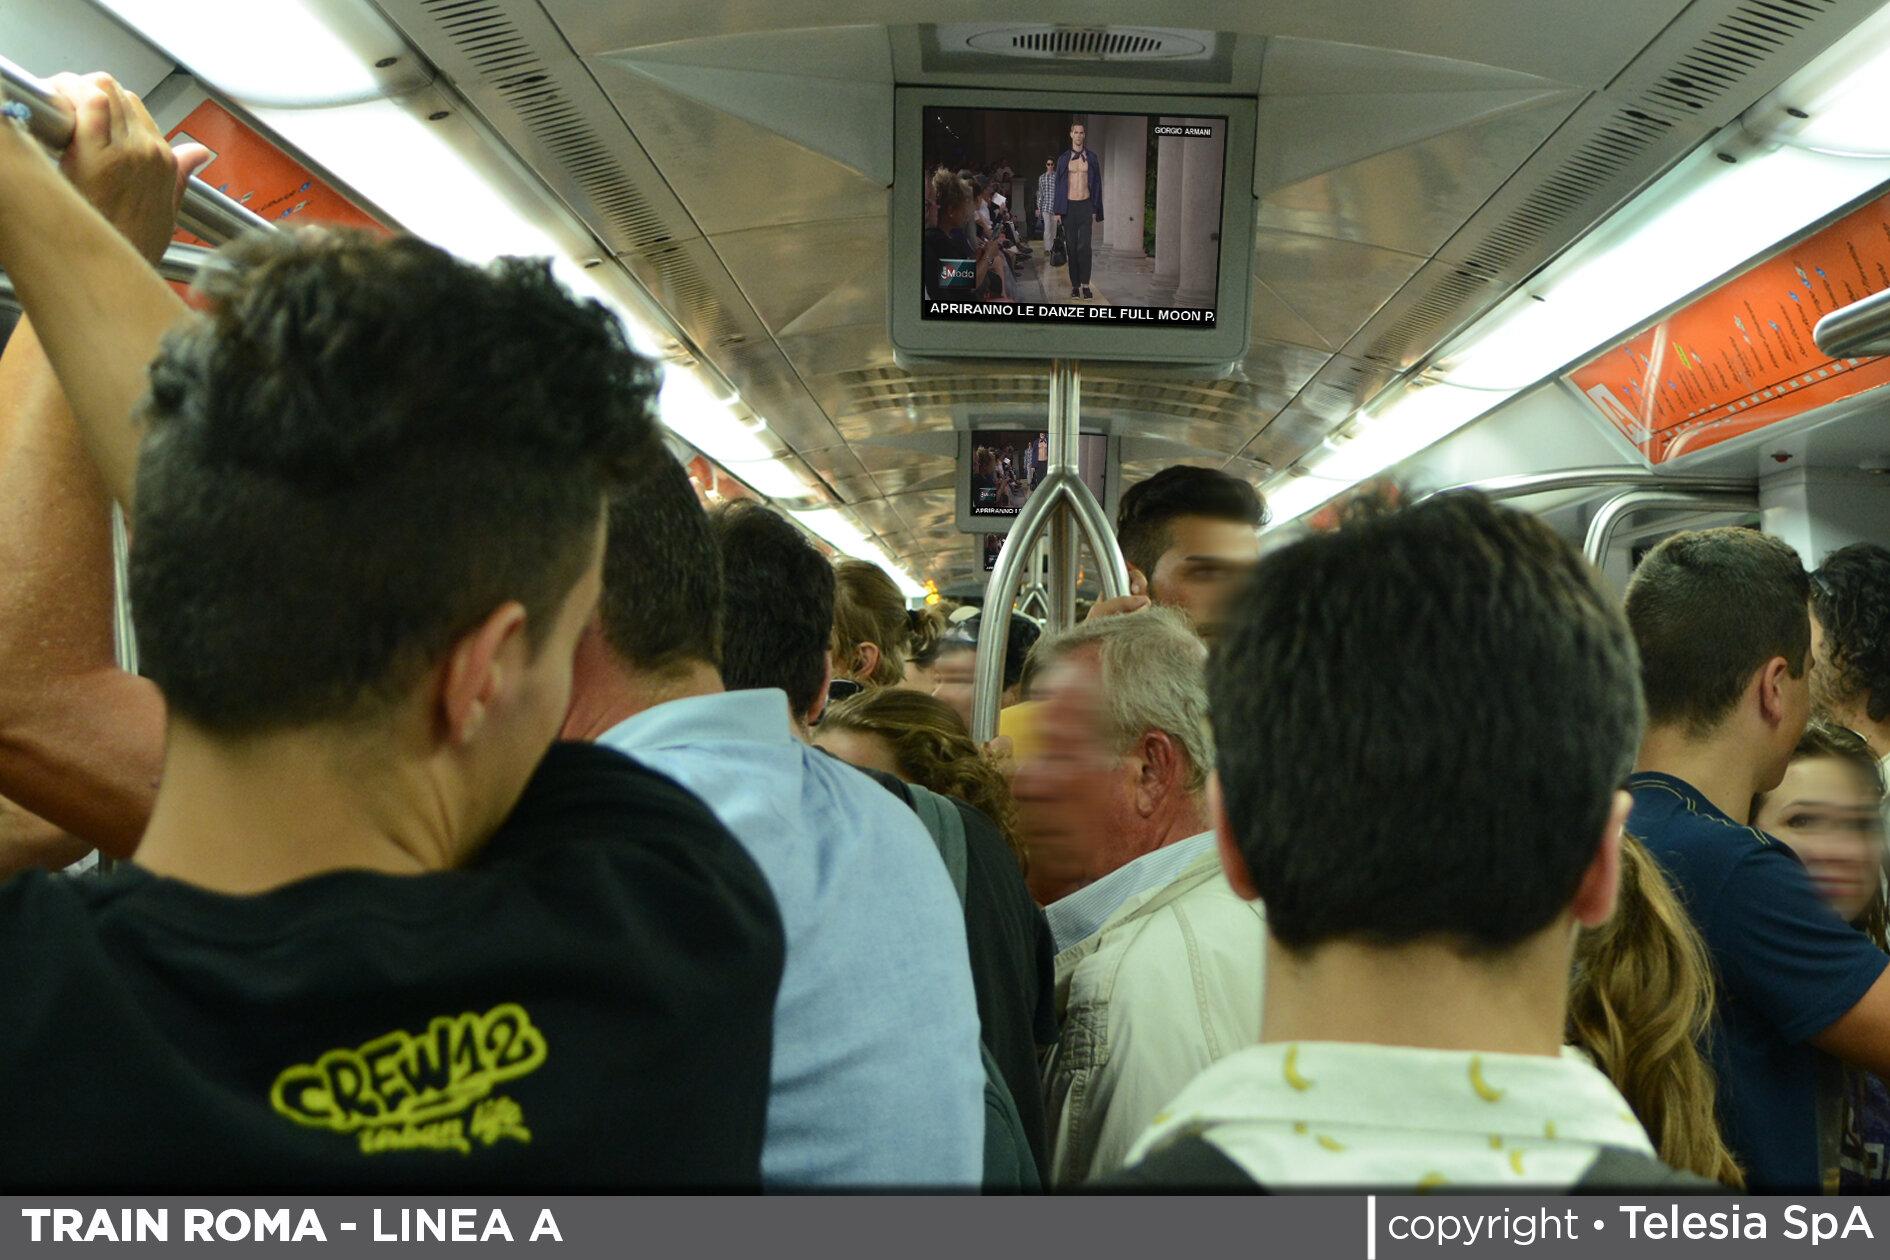 T_train4.jpg